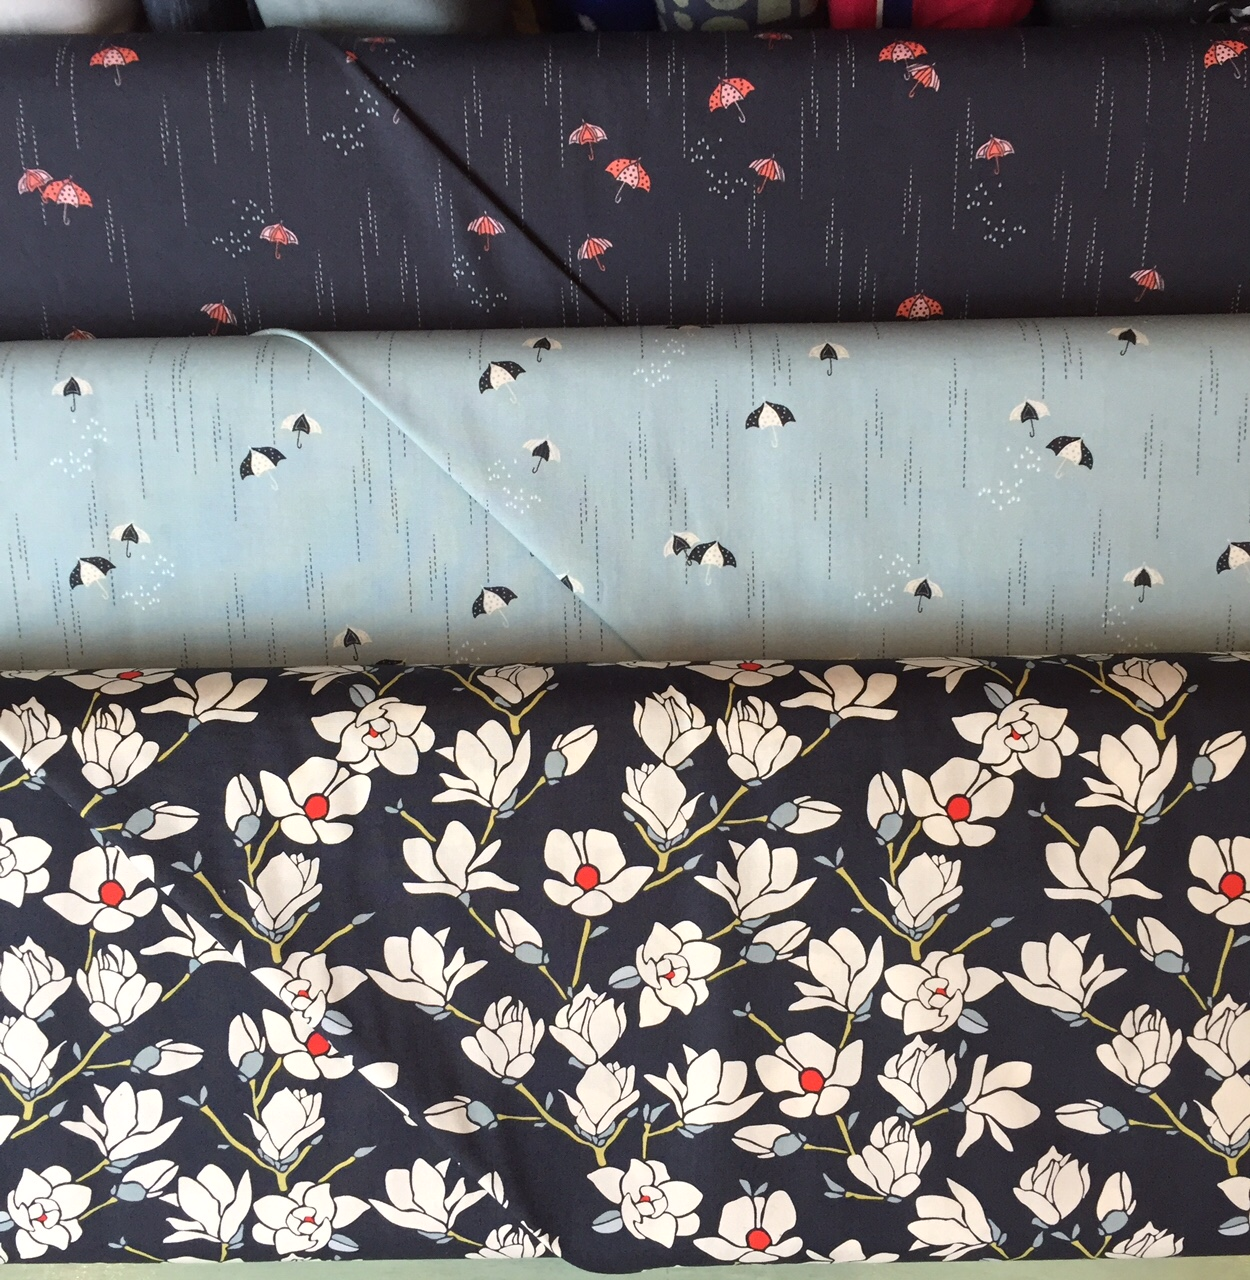 Magnolias and umbrellas from Art Gallery